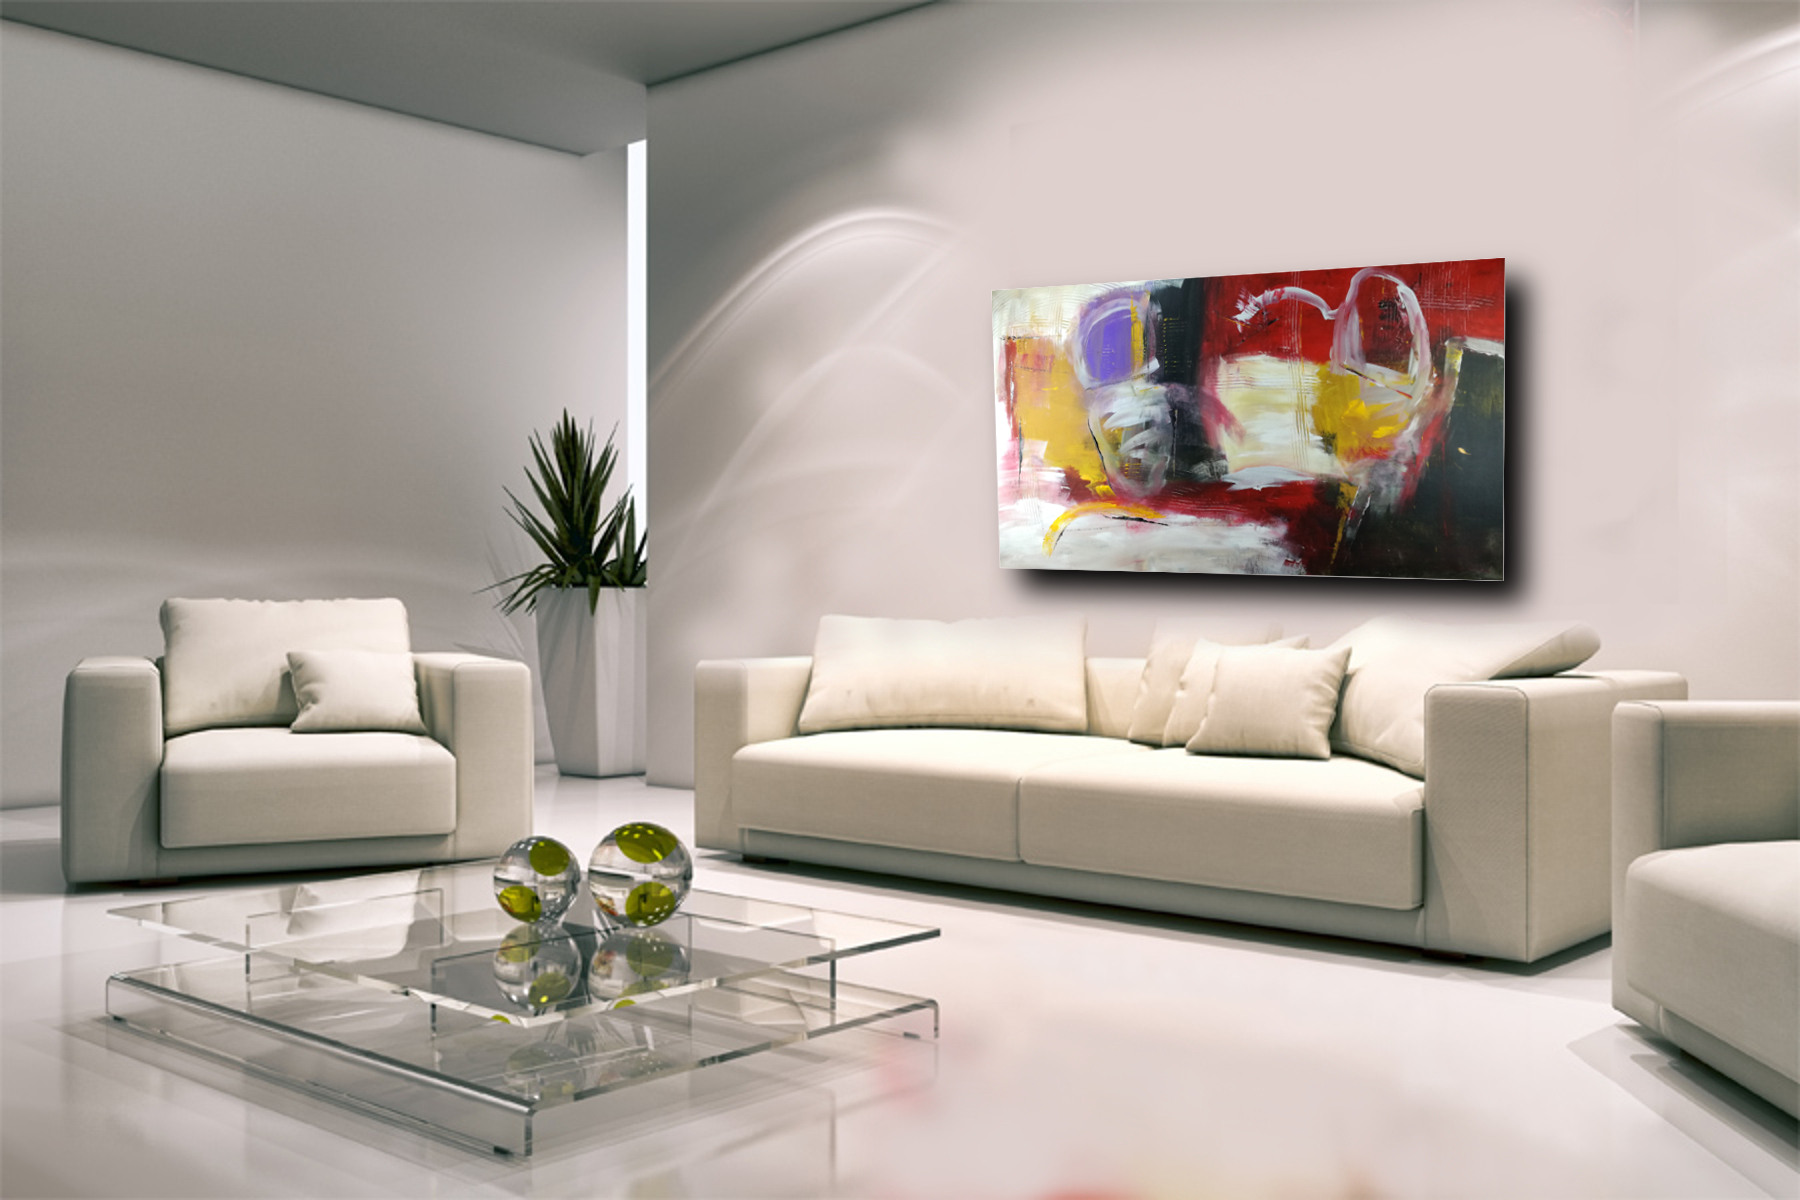 dipinto a mano astratto olio su tela 150x80 | sauro bos